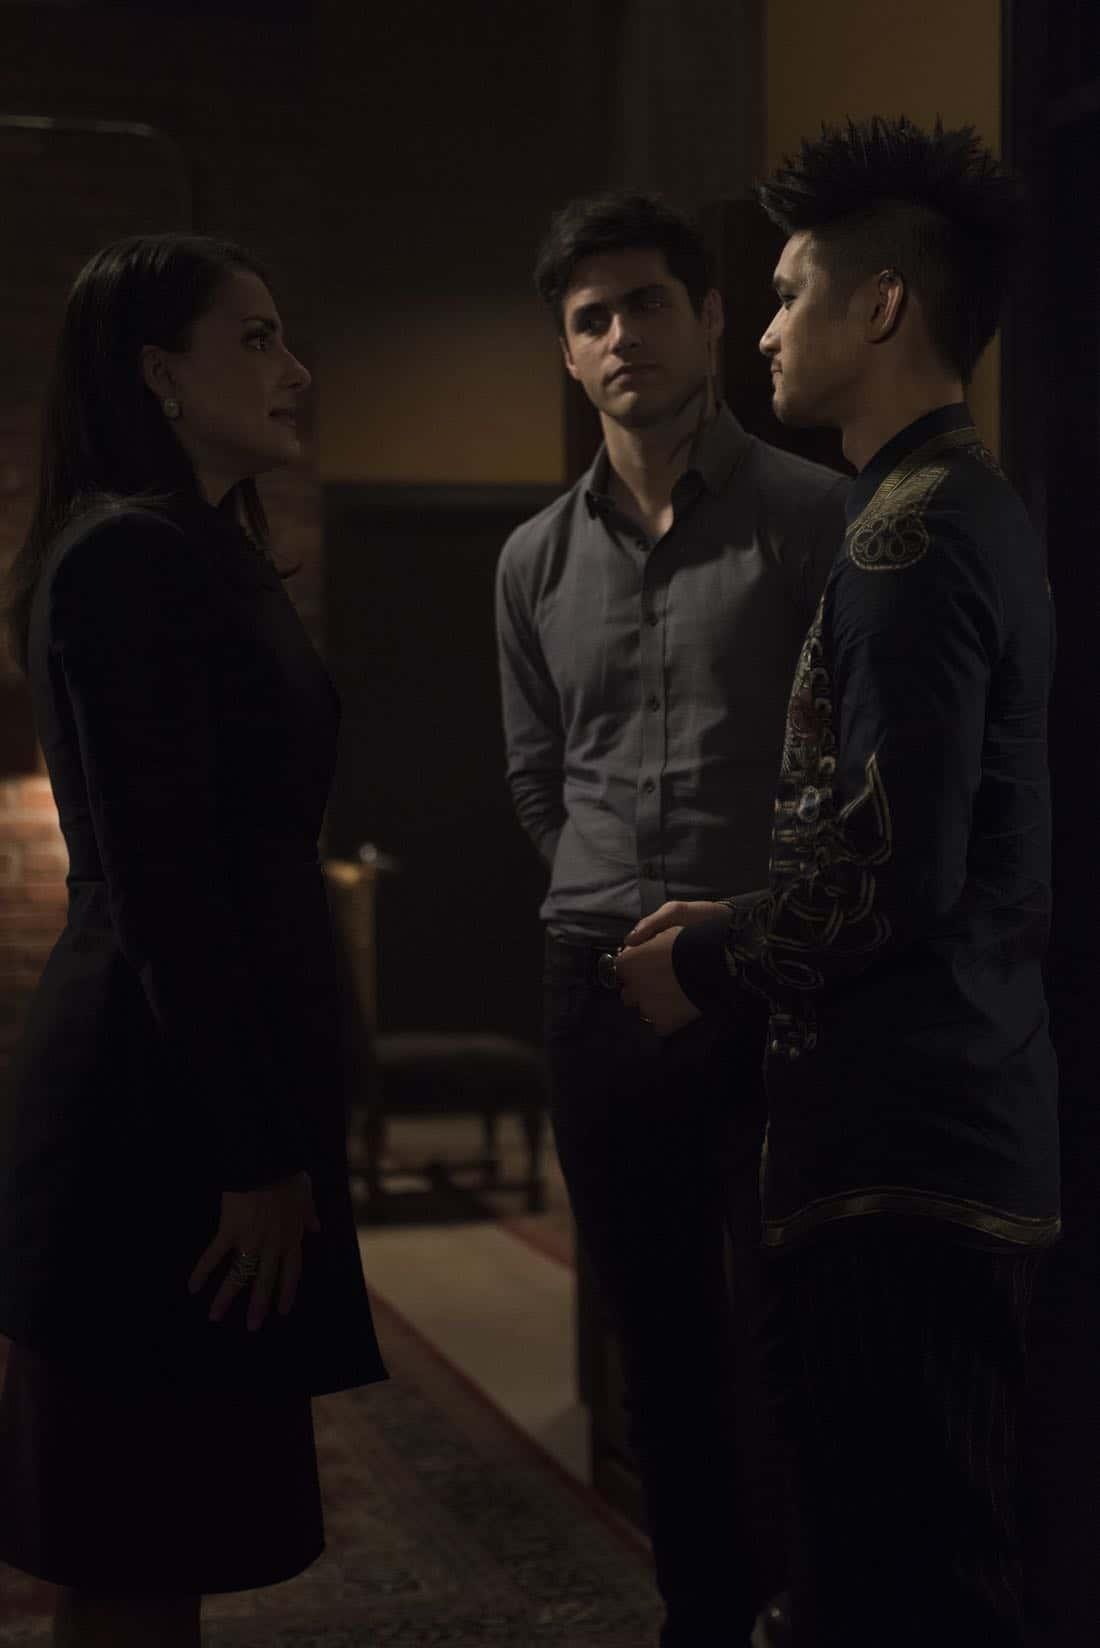 Shadowhunters Episode 3 Season 3 What Lies Beneath 49